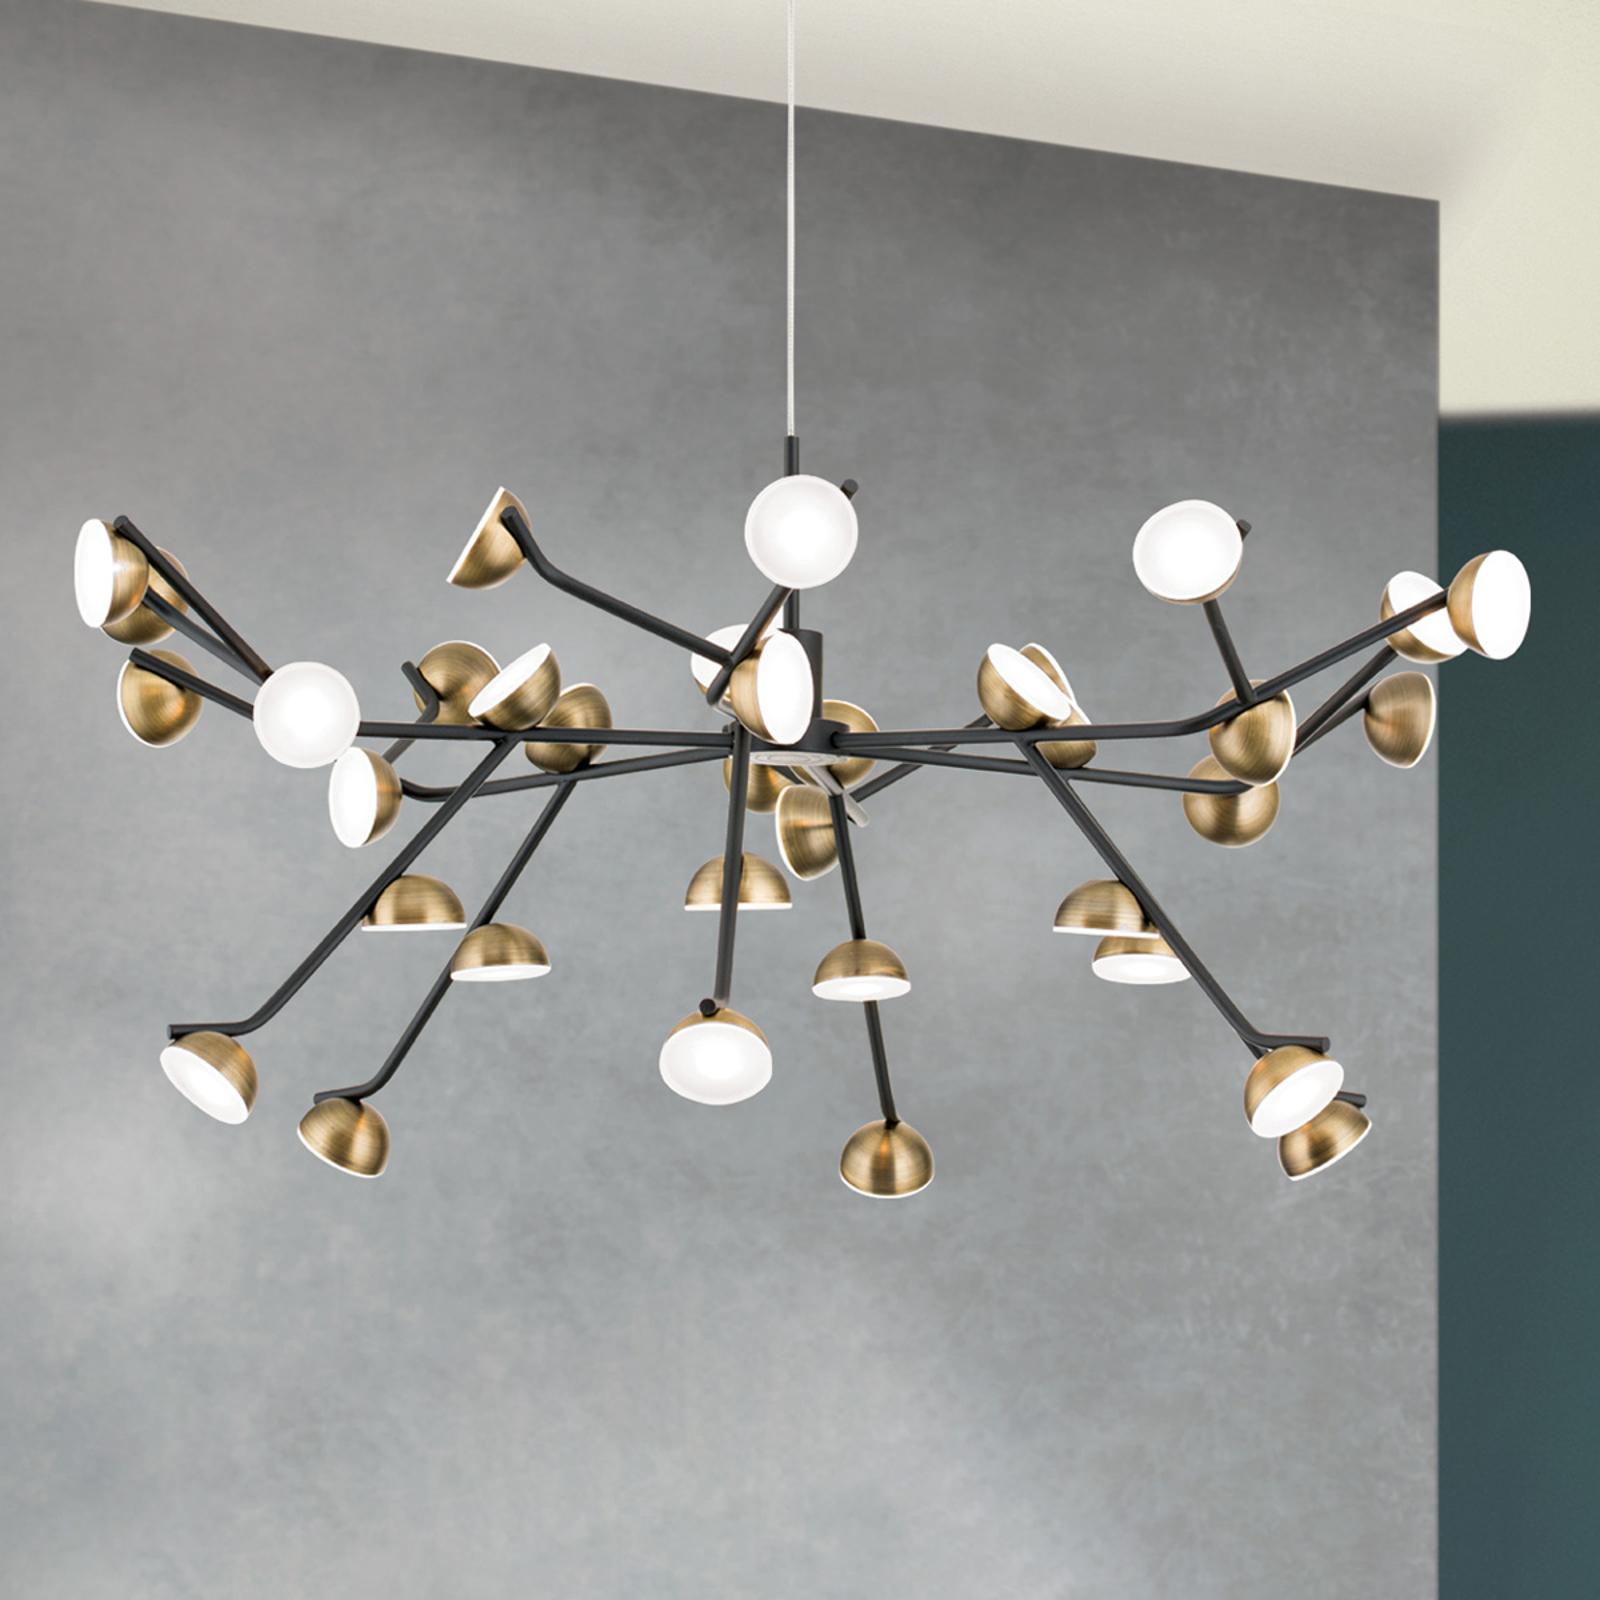 Lampa wisząca LED Blossom, 36-punktowa